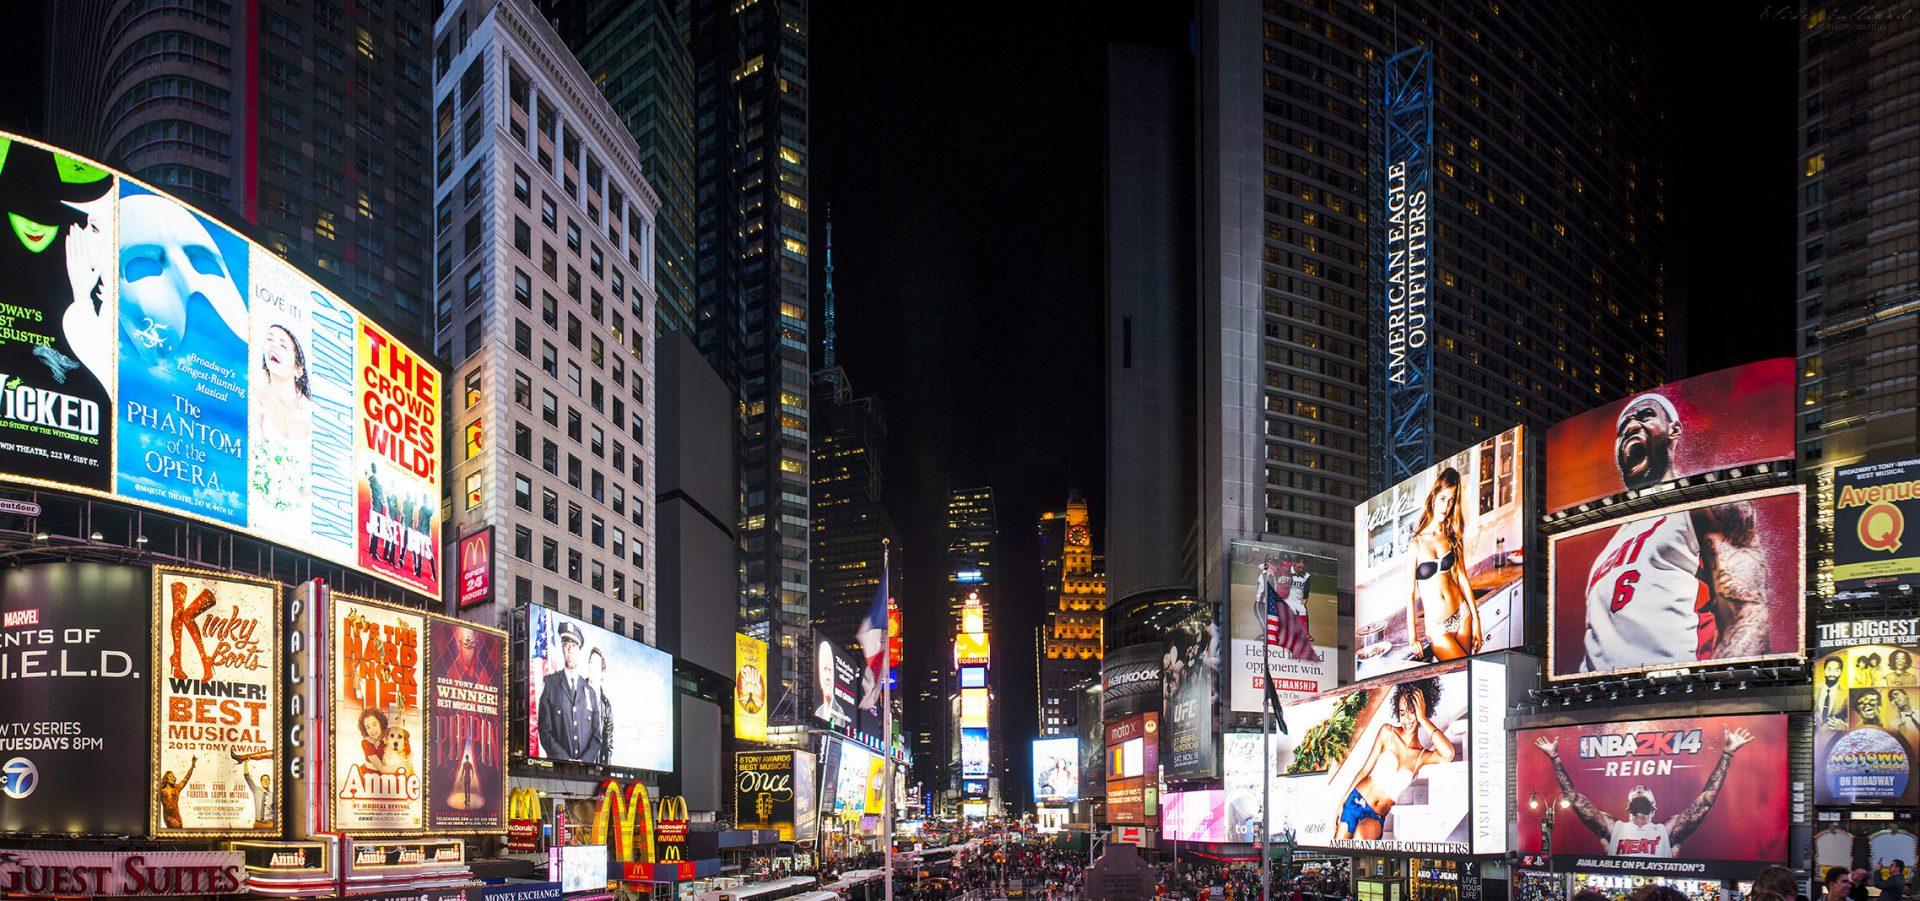 elise-julliard-photographe-panorama-new-york-time-square-nuit-manhattan